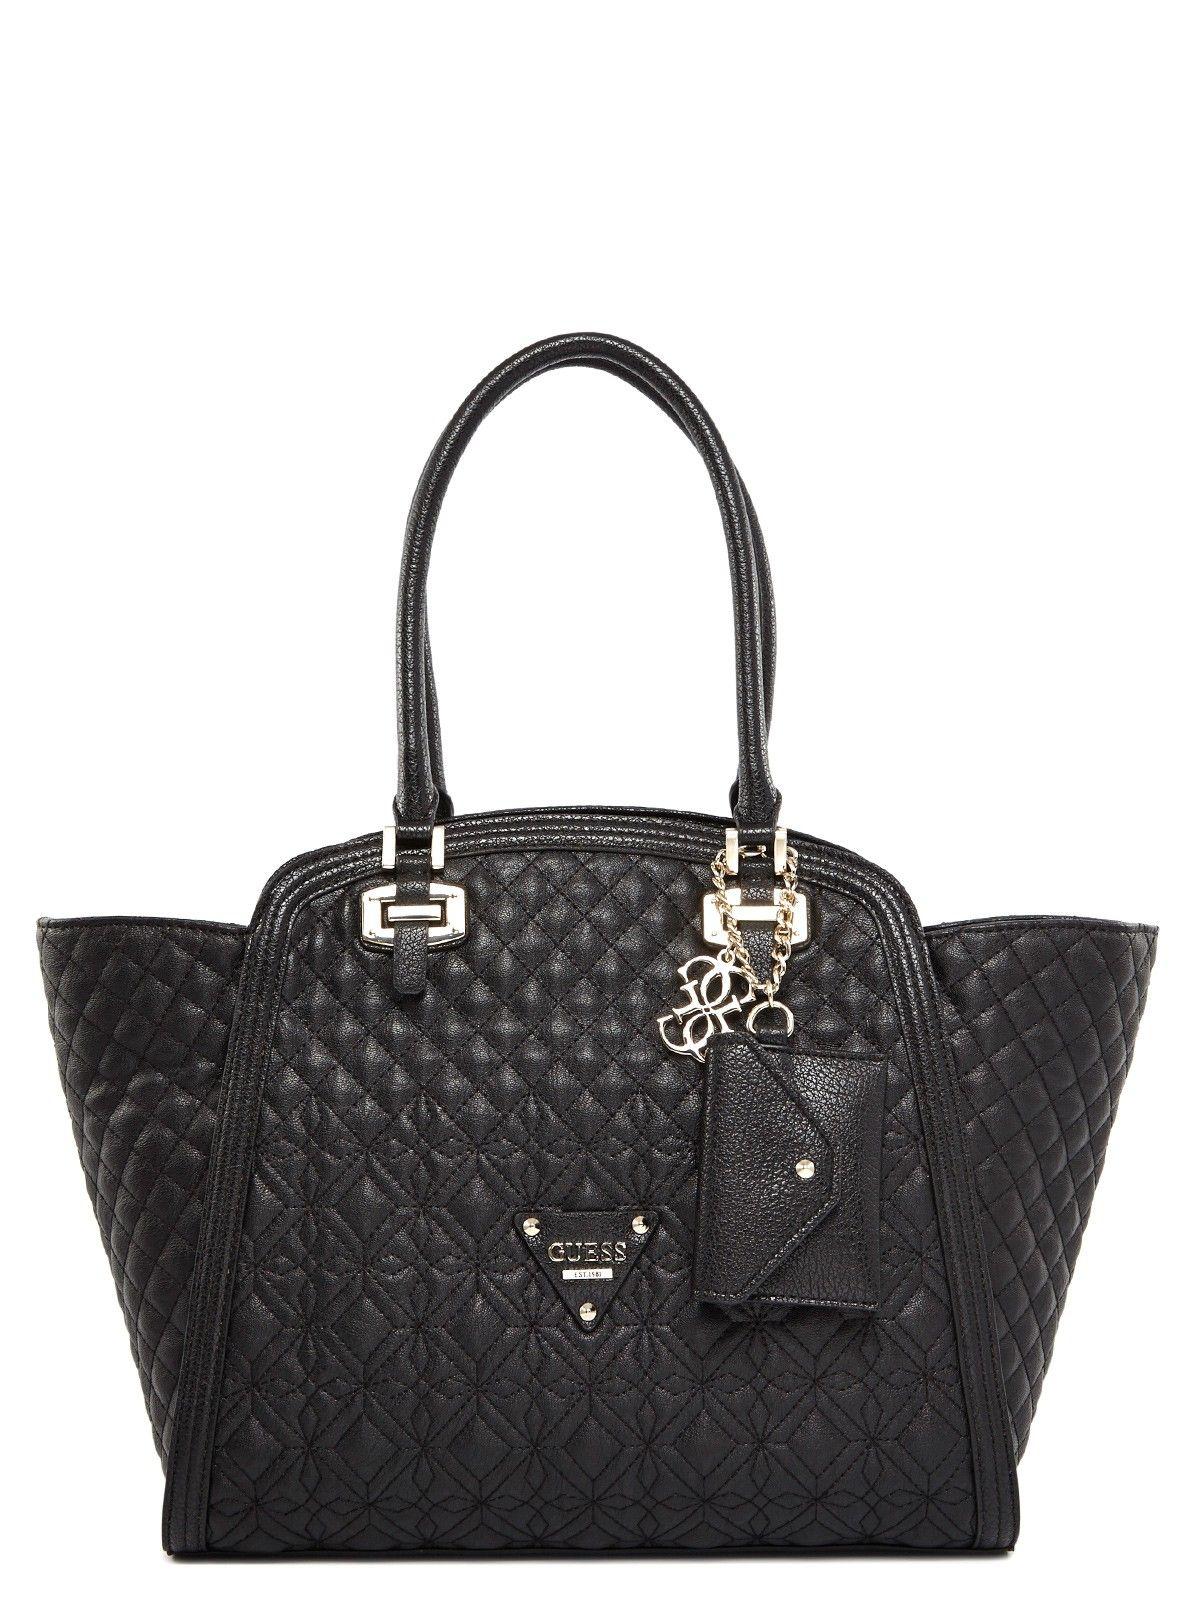 GUESS HWVG49 33230 Tasche Schwarz Taschen Accessoires